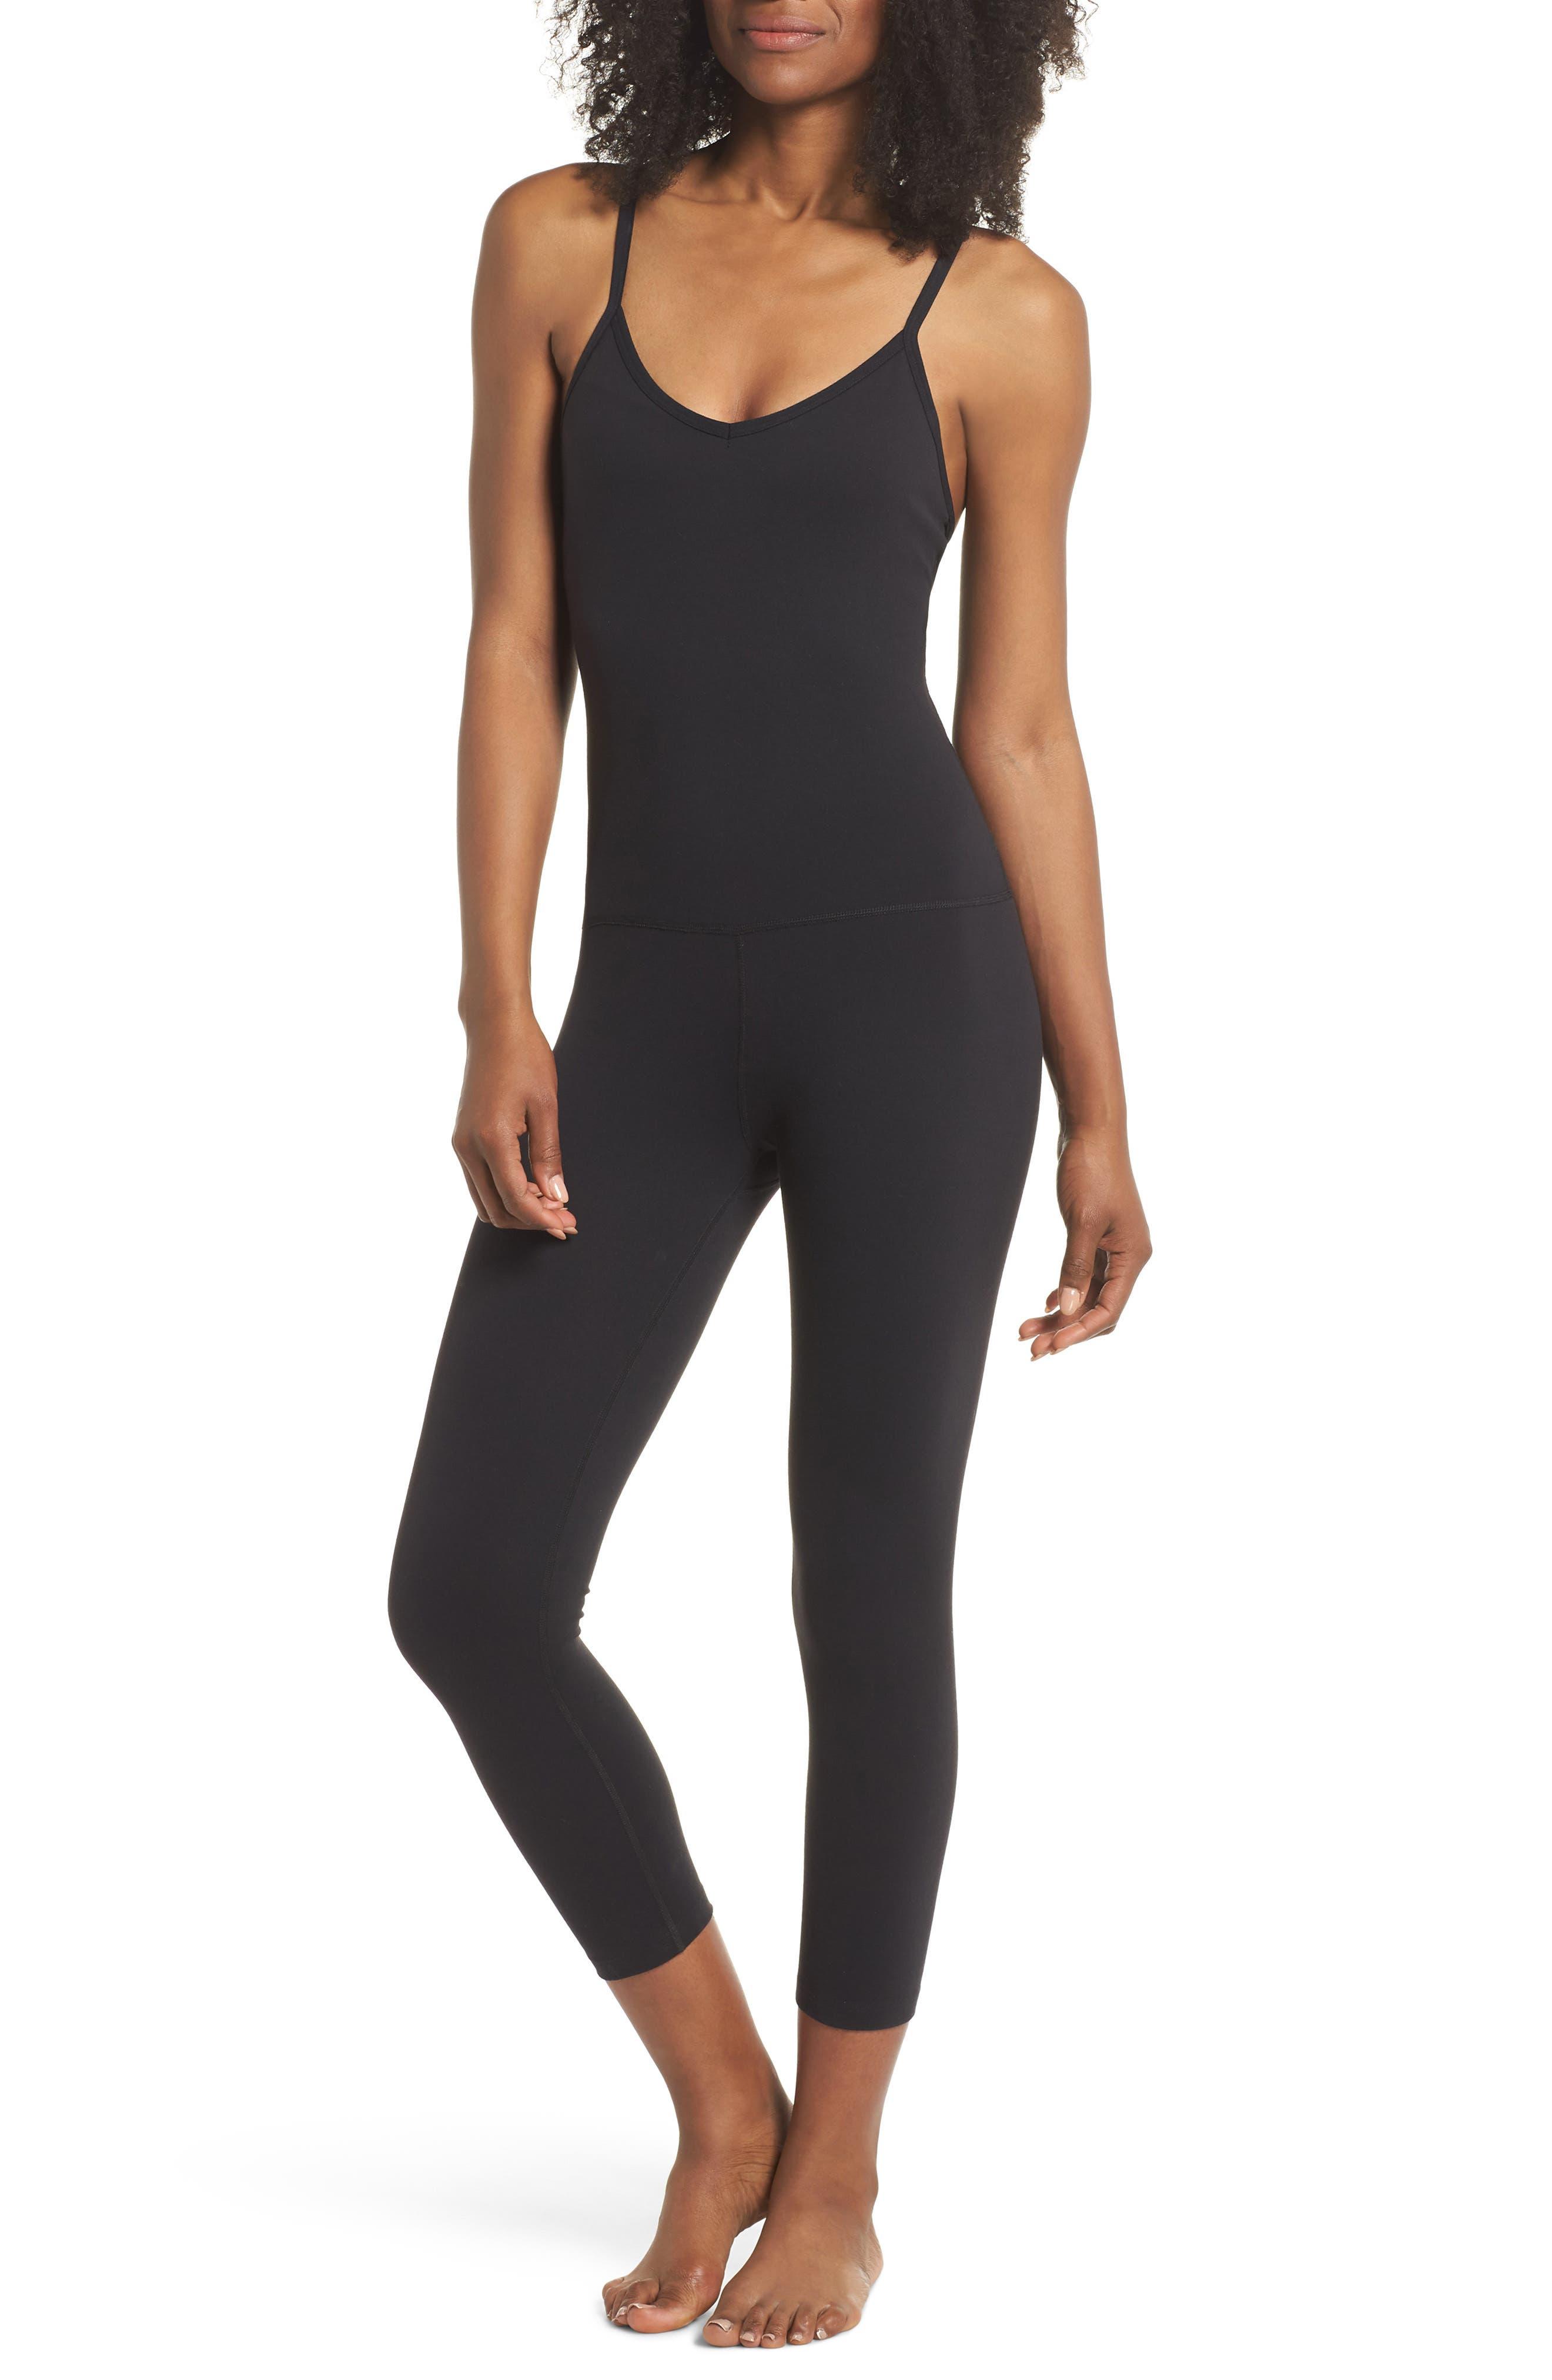 Levels Shelf Bra Bodysuit,                         Main,                         color, Jet Black